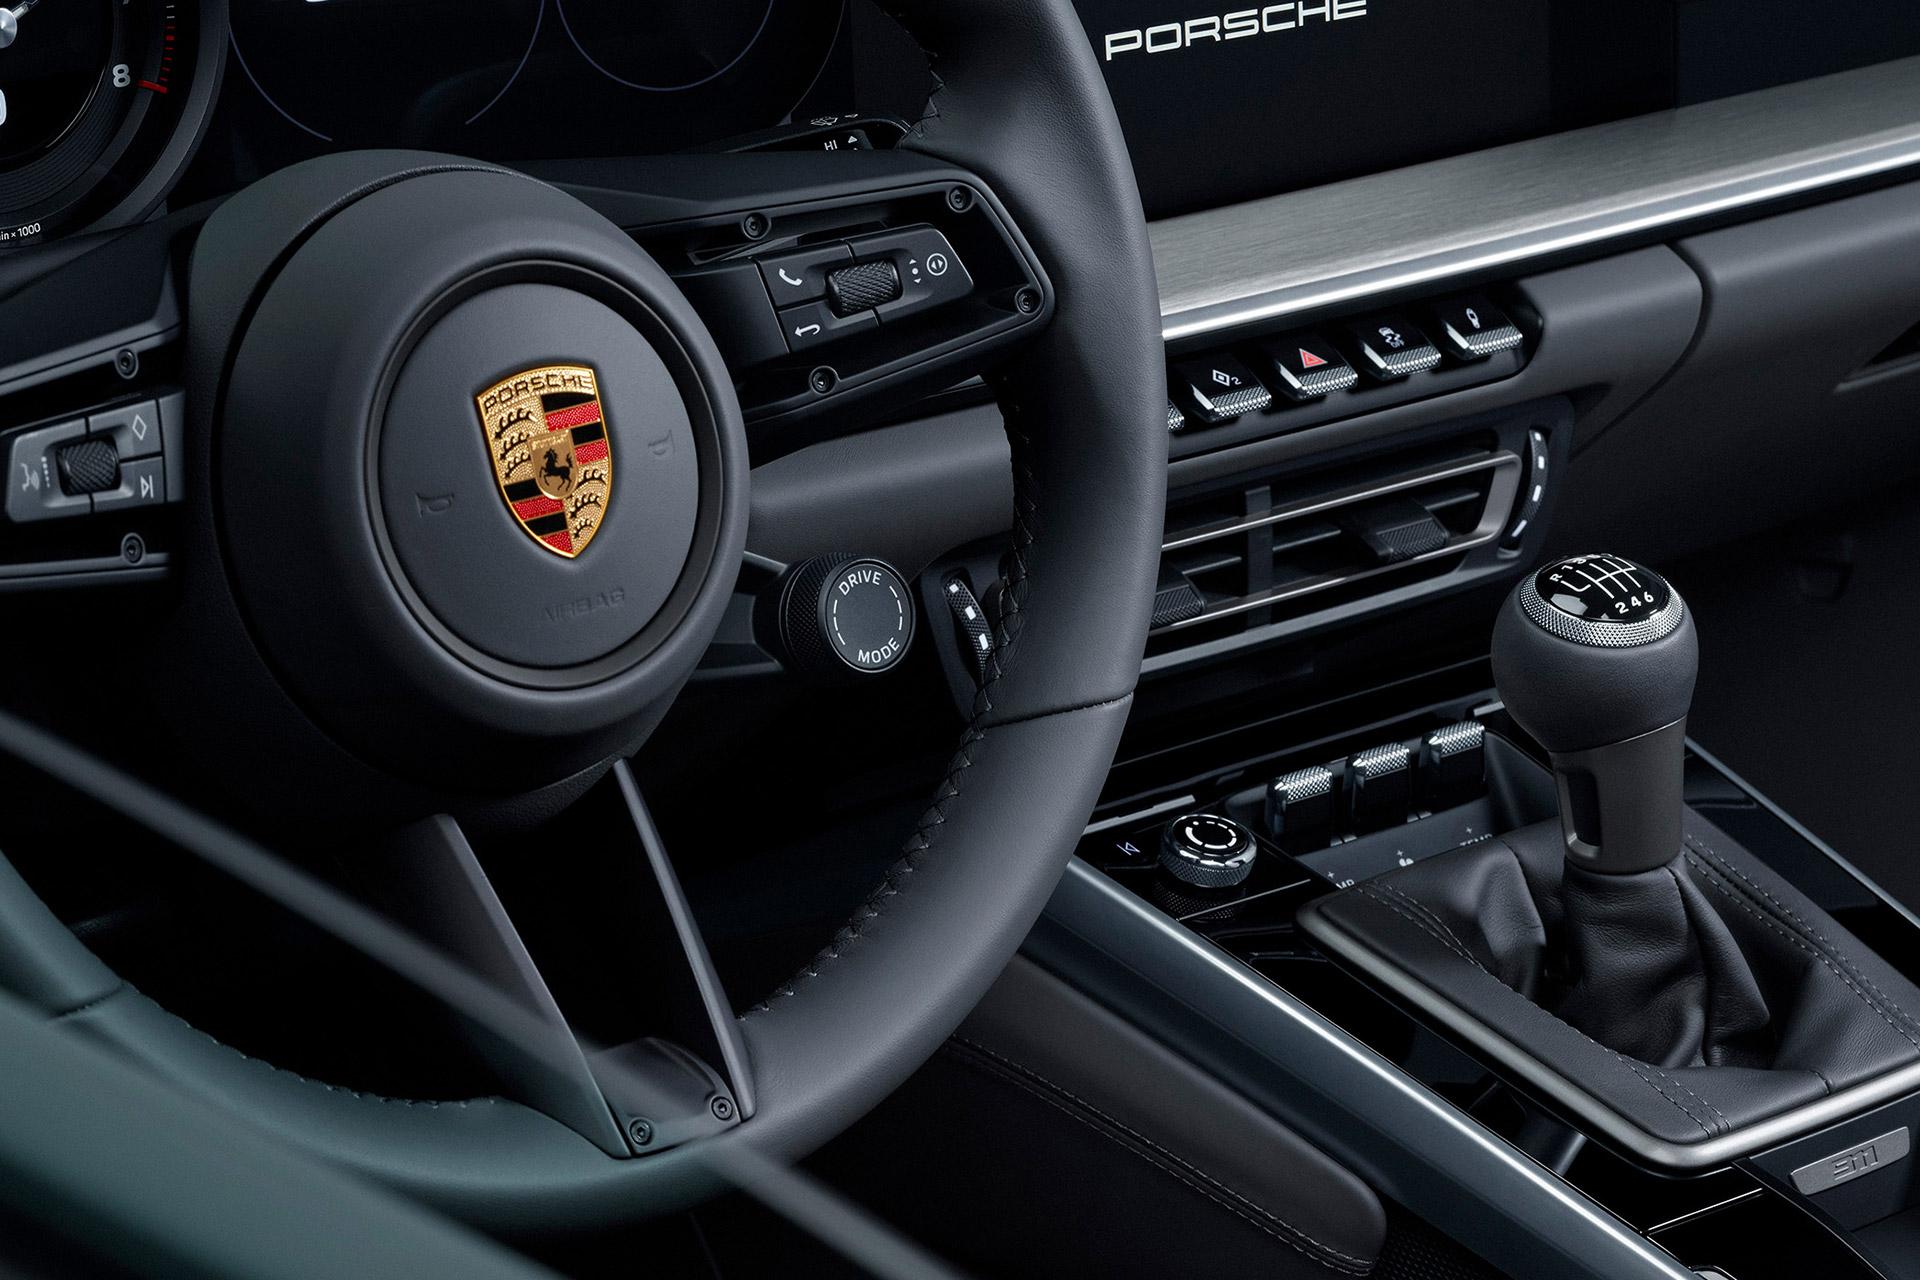 2020 Porsche 911 Manual Transmission